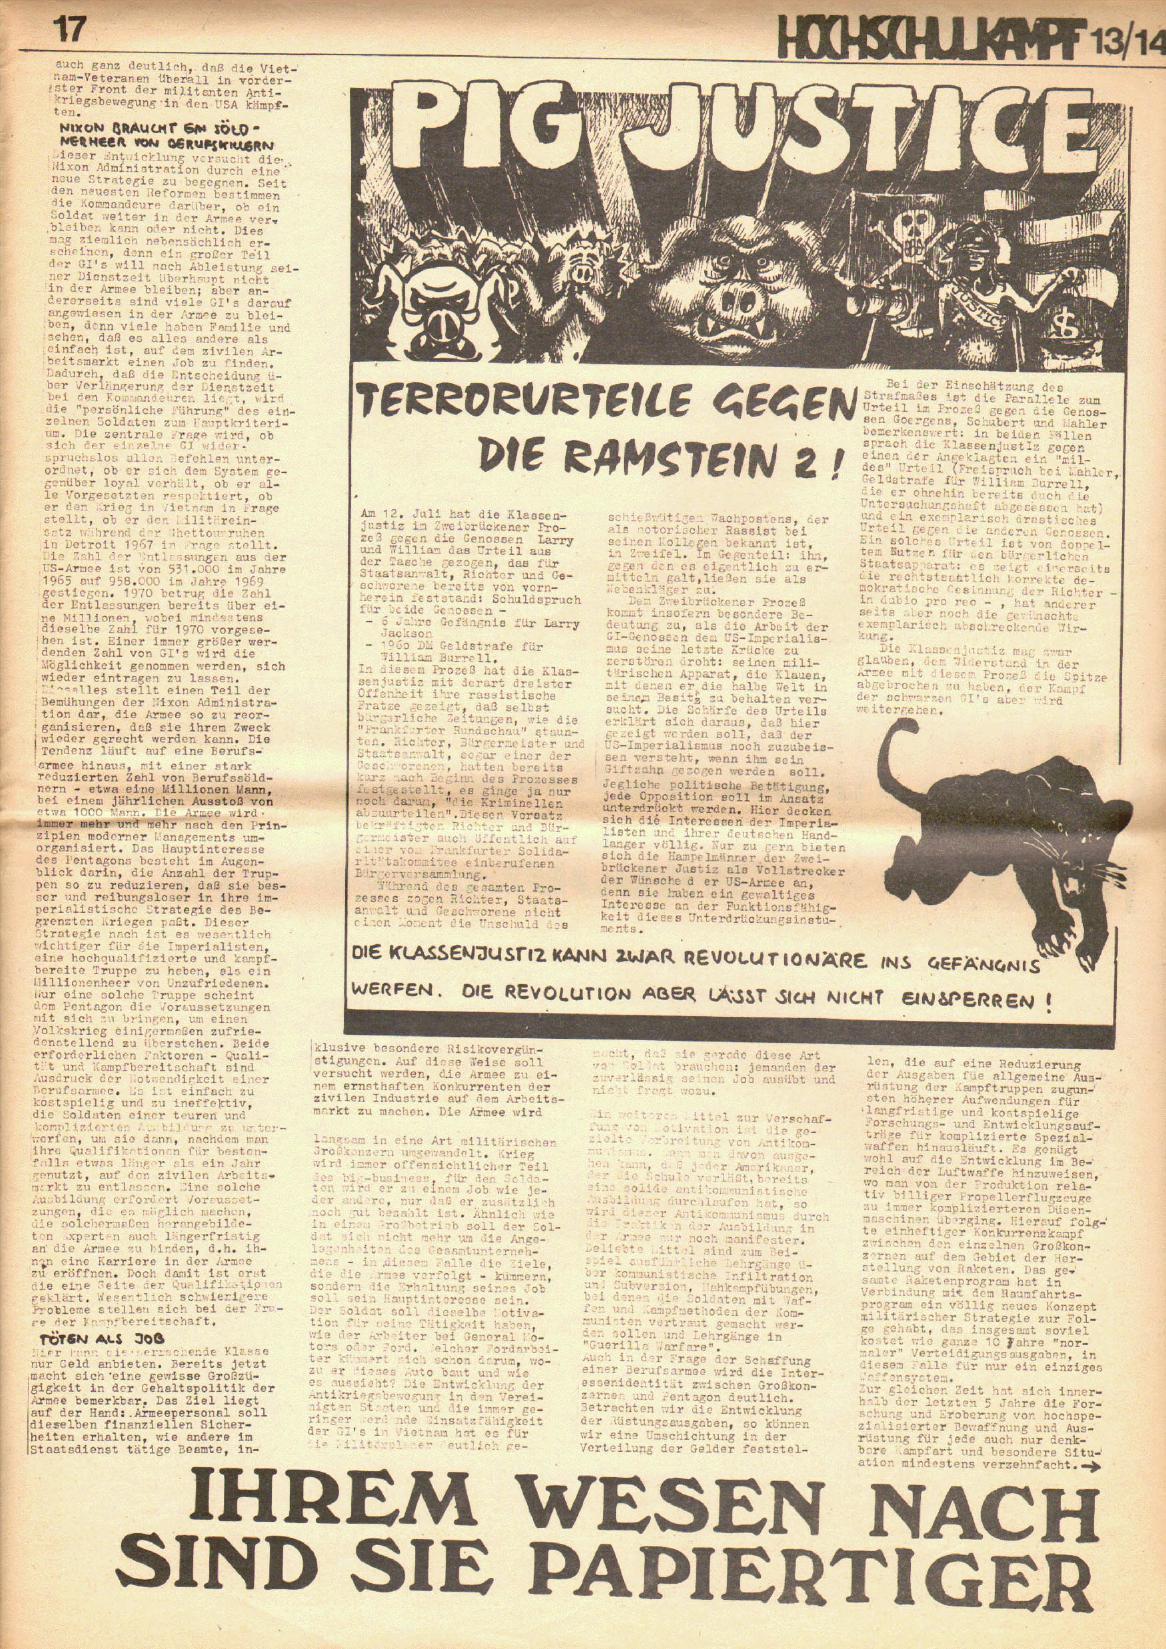 Berlin_Hochschulkampf_1971_13_17